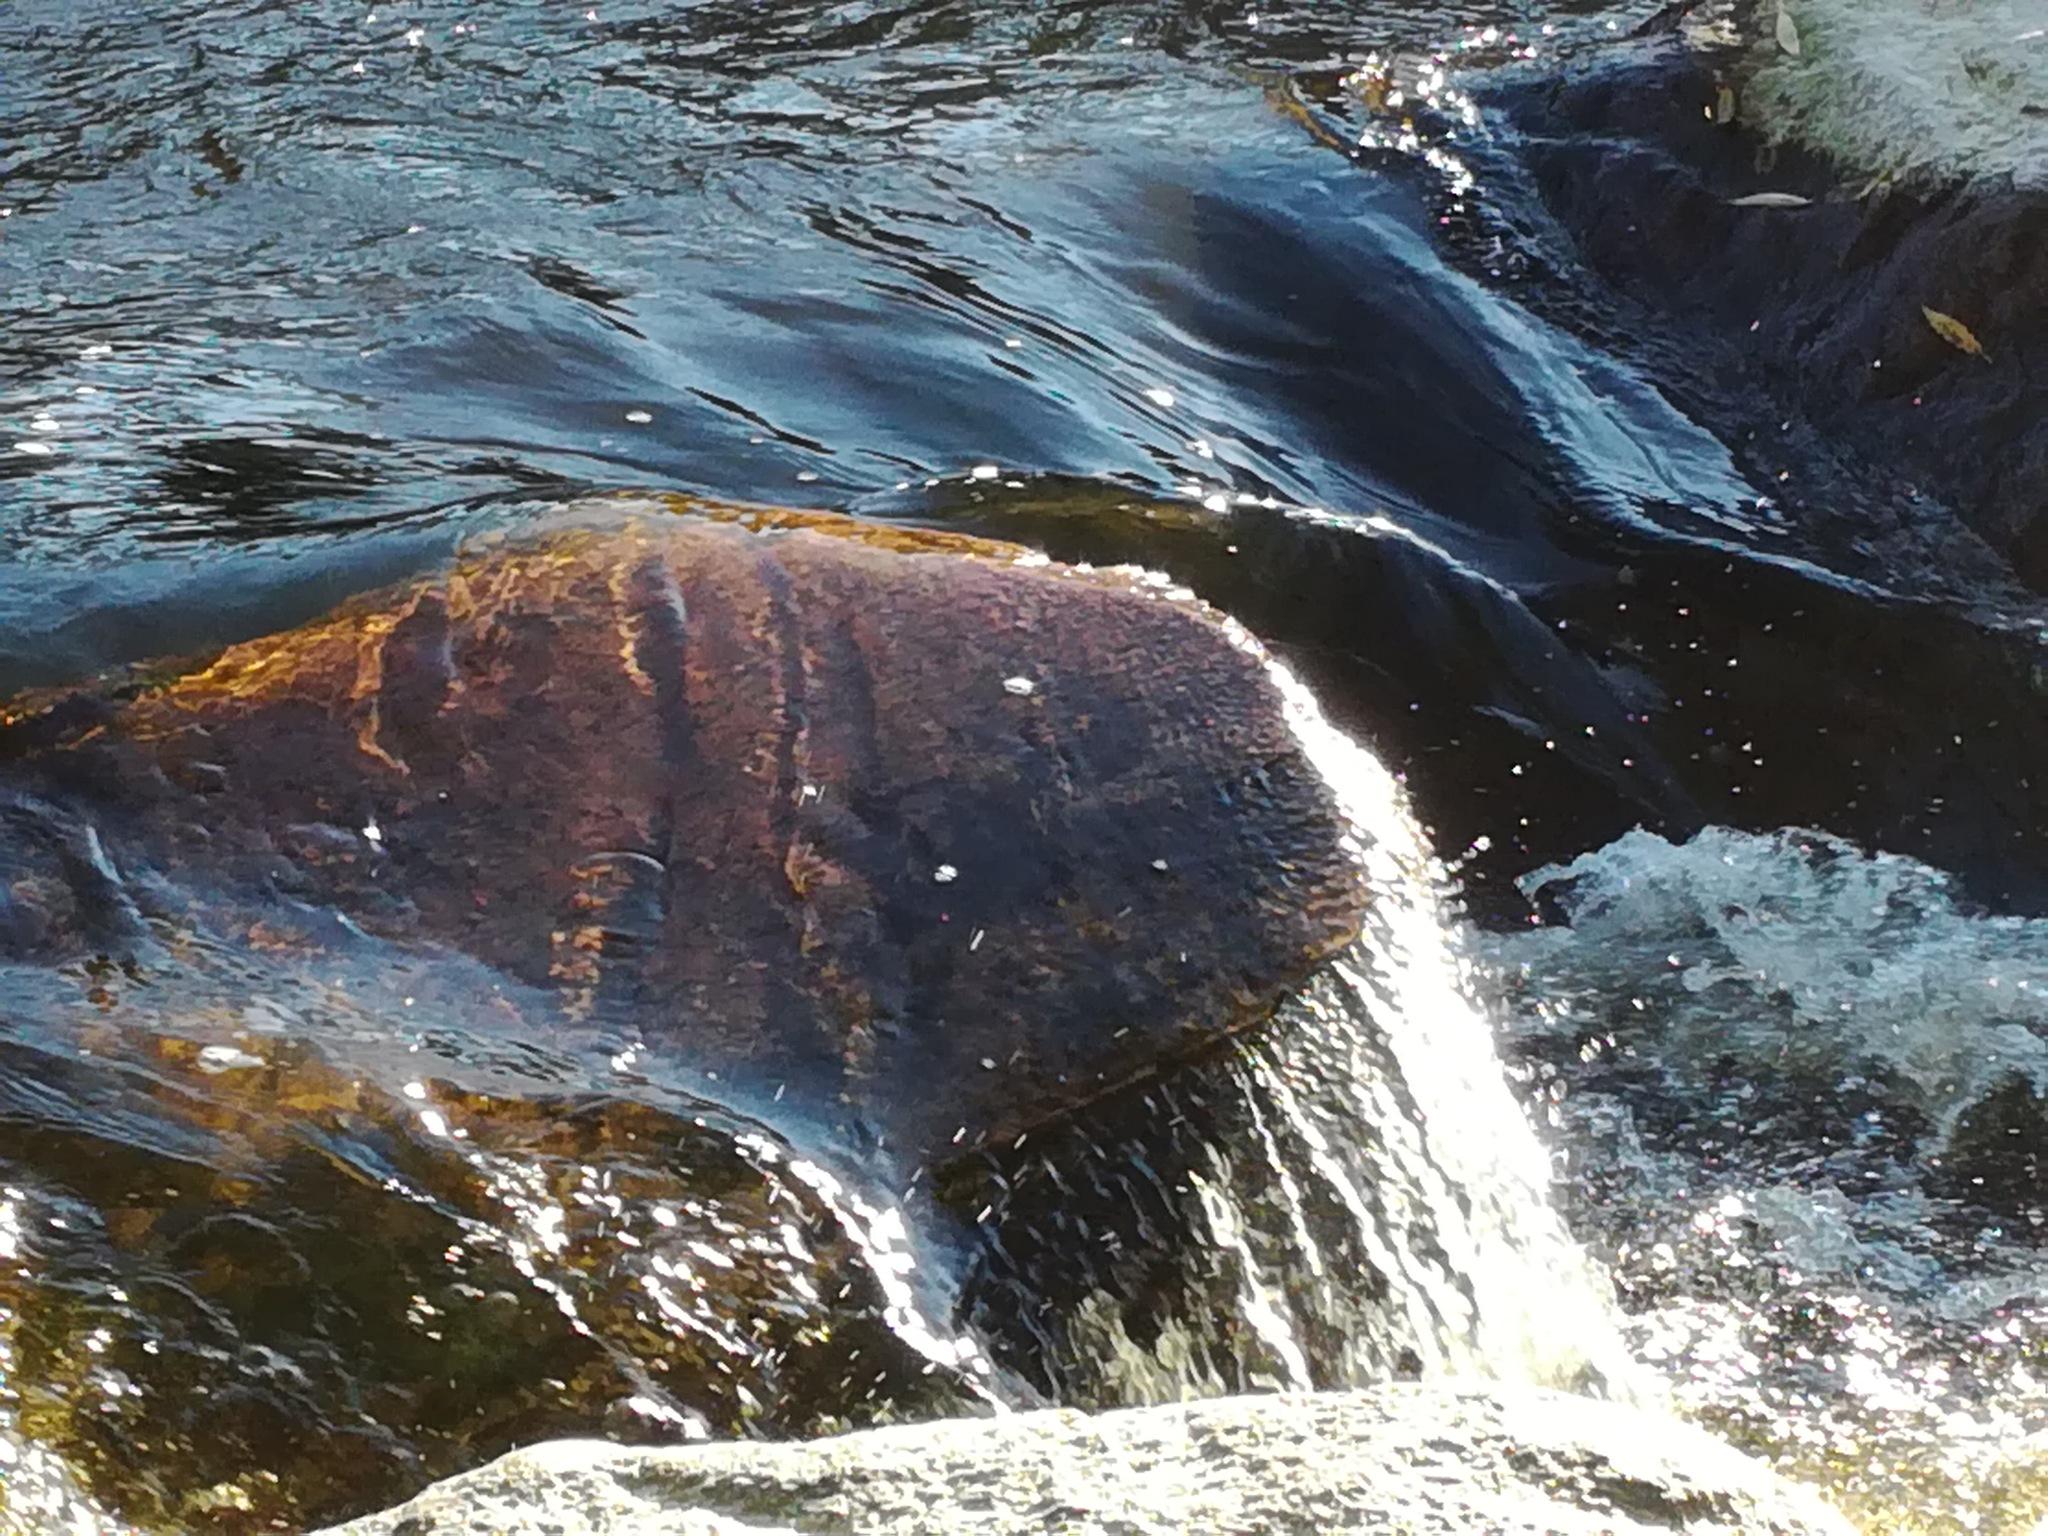 Stones in the river by uzkuraitiene62